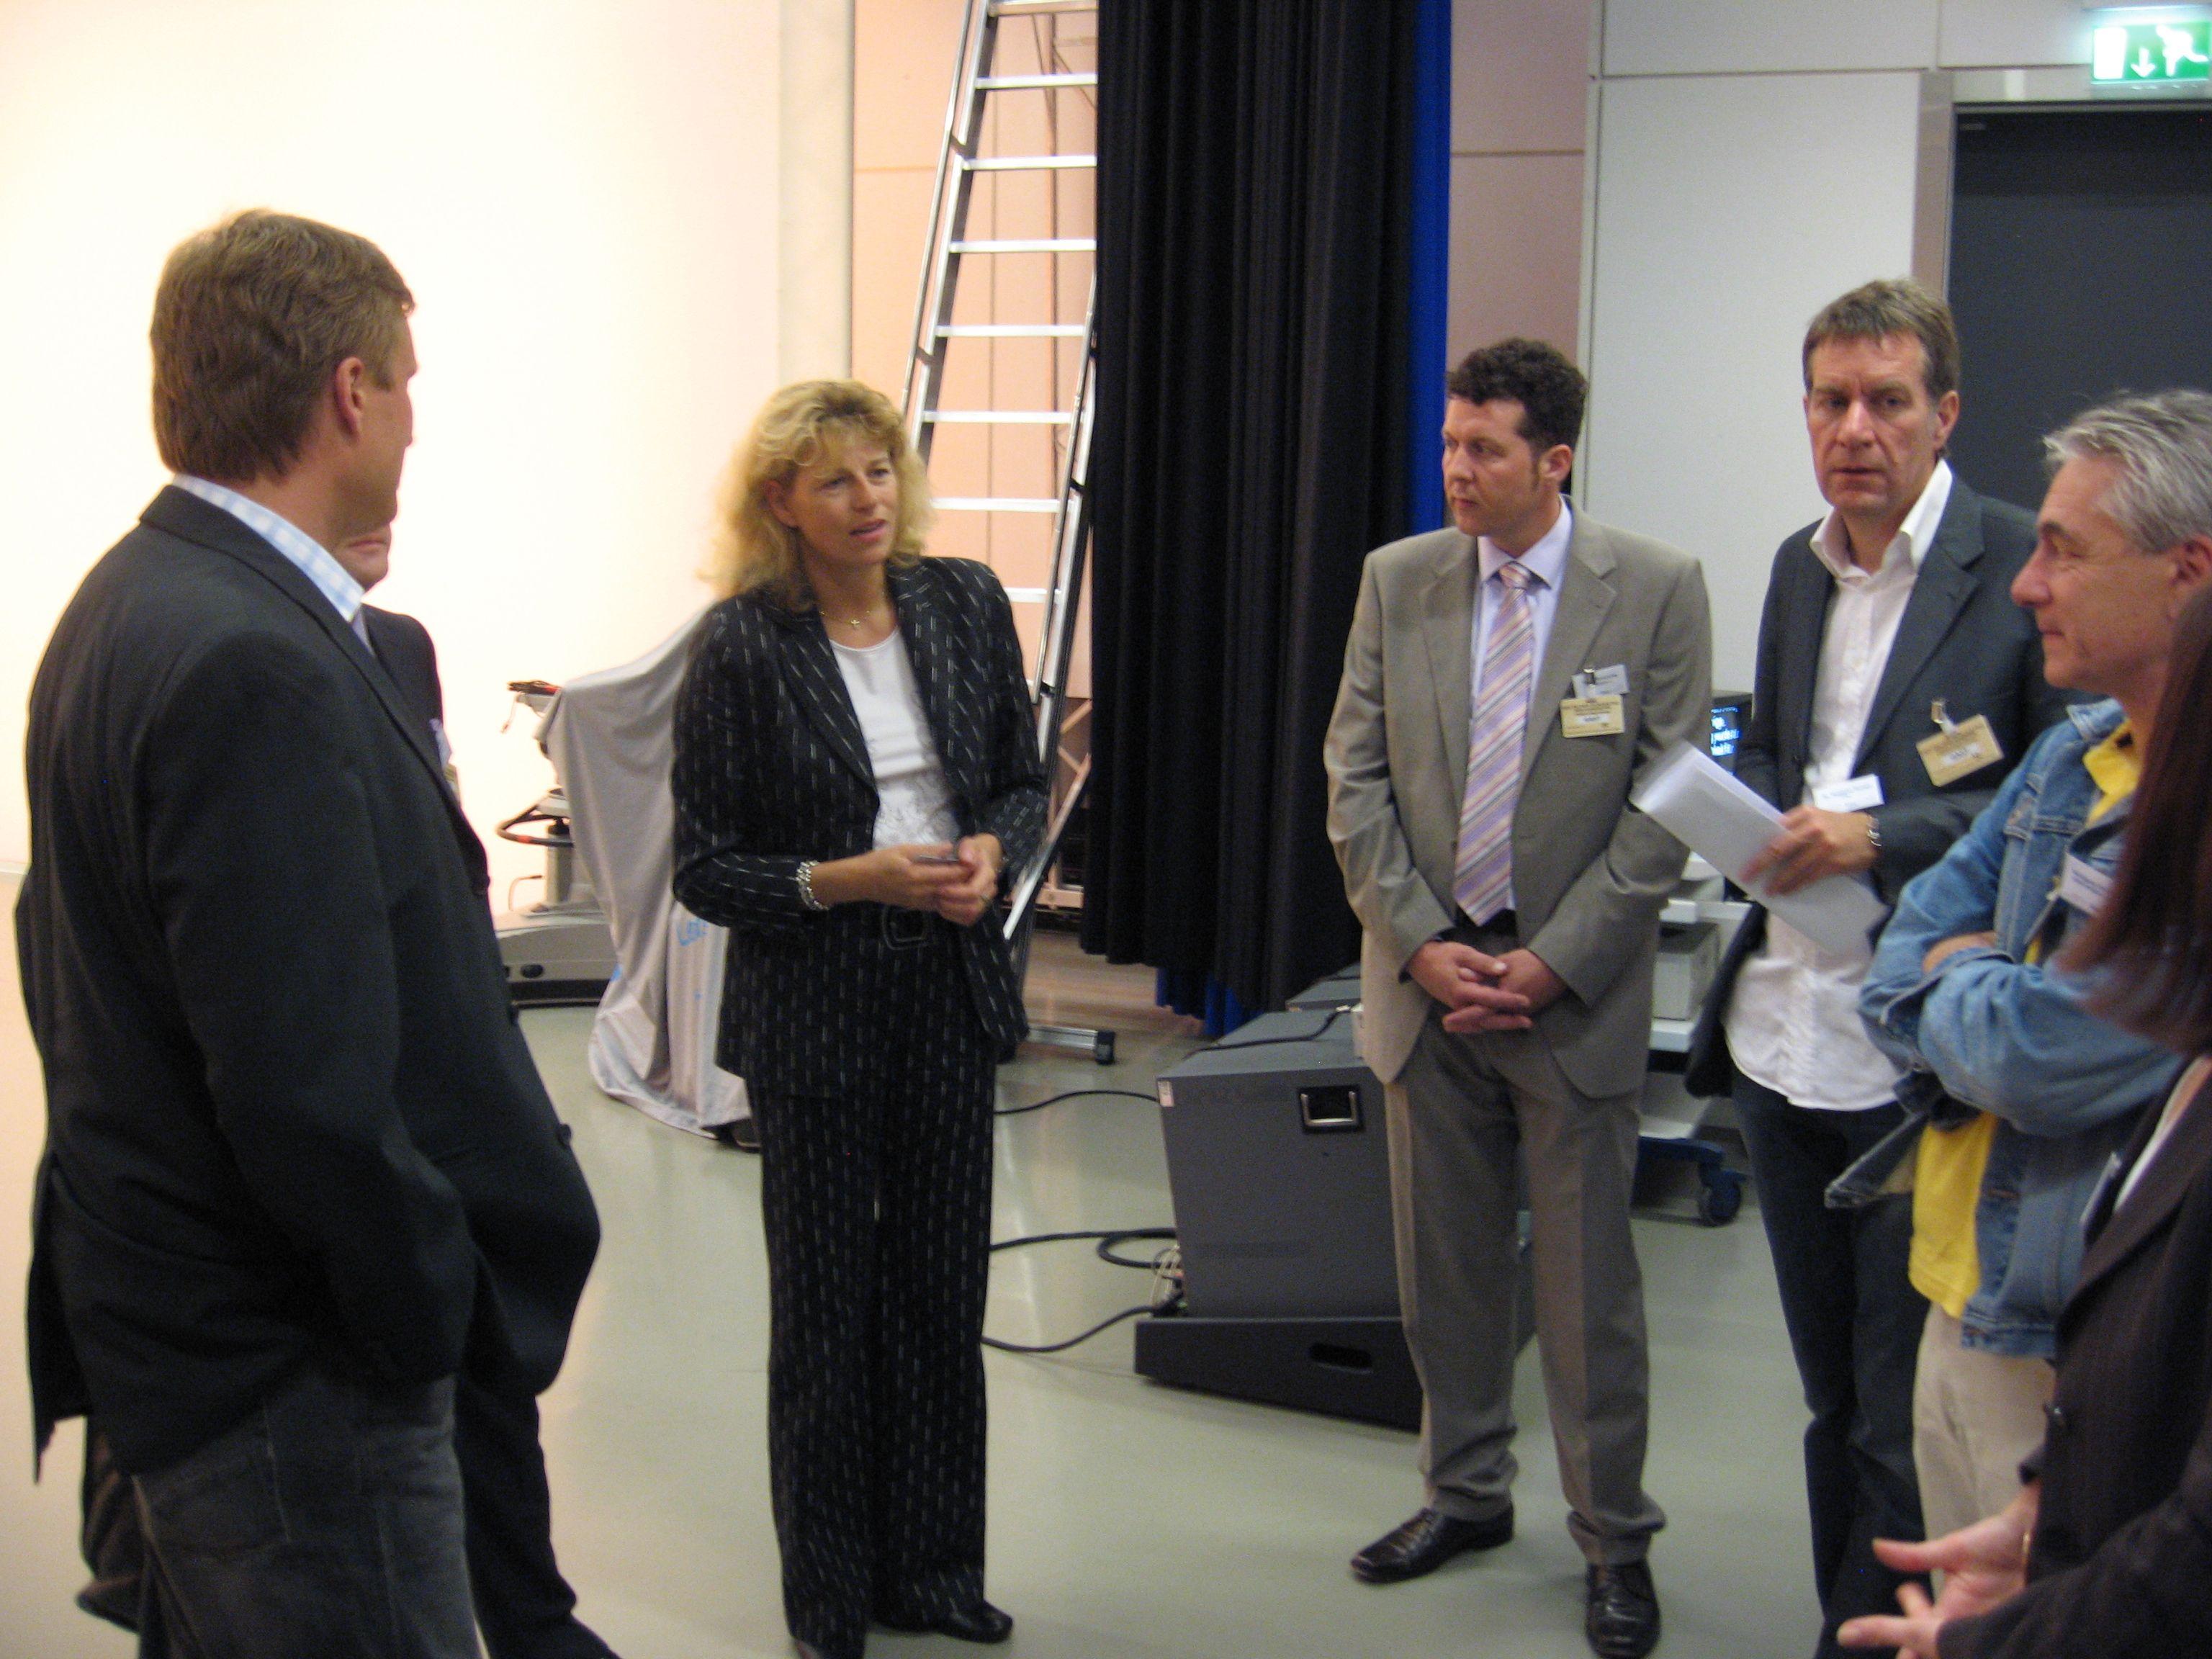 CTVA e.V. zu Besuch bei BundestagsTV; Dr. Maika Jachmann (Leitung BundestagTV, 3.v.l.) im Gespräch u.a. mit Dr. Matthias Kunert (Vosrtand CTVA, 3.v.r.)